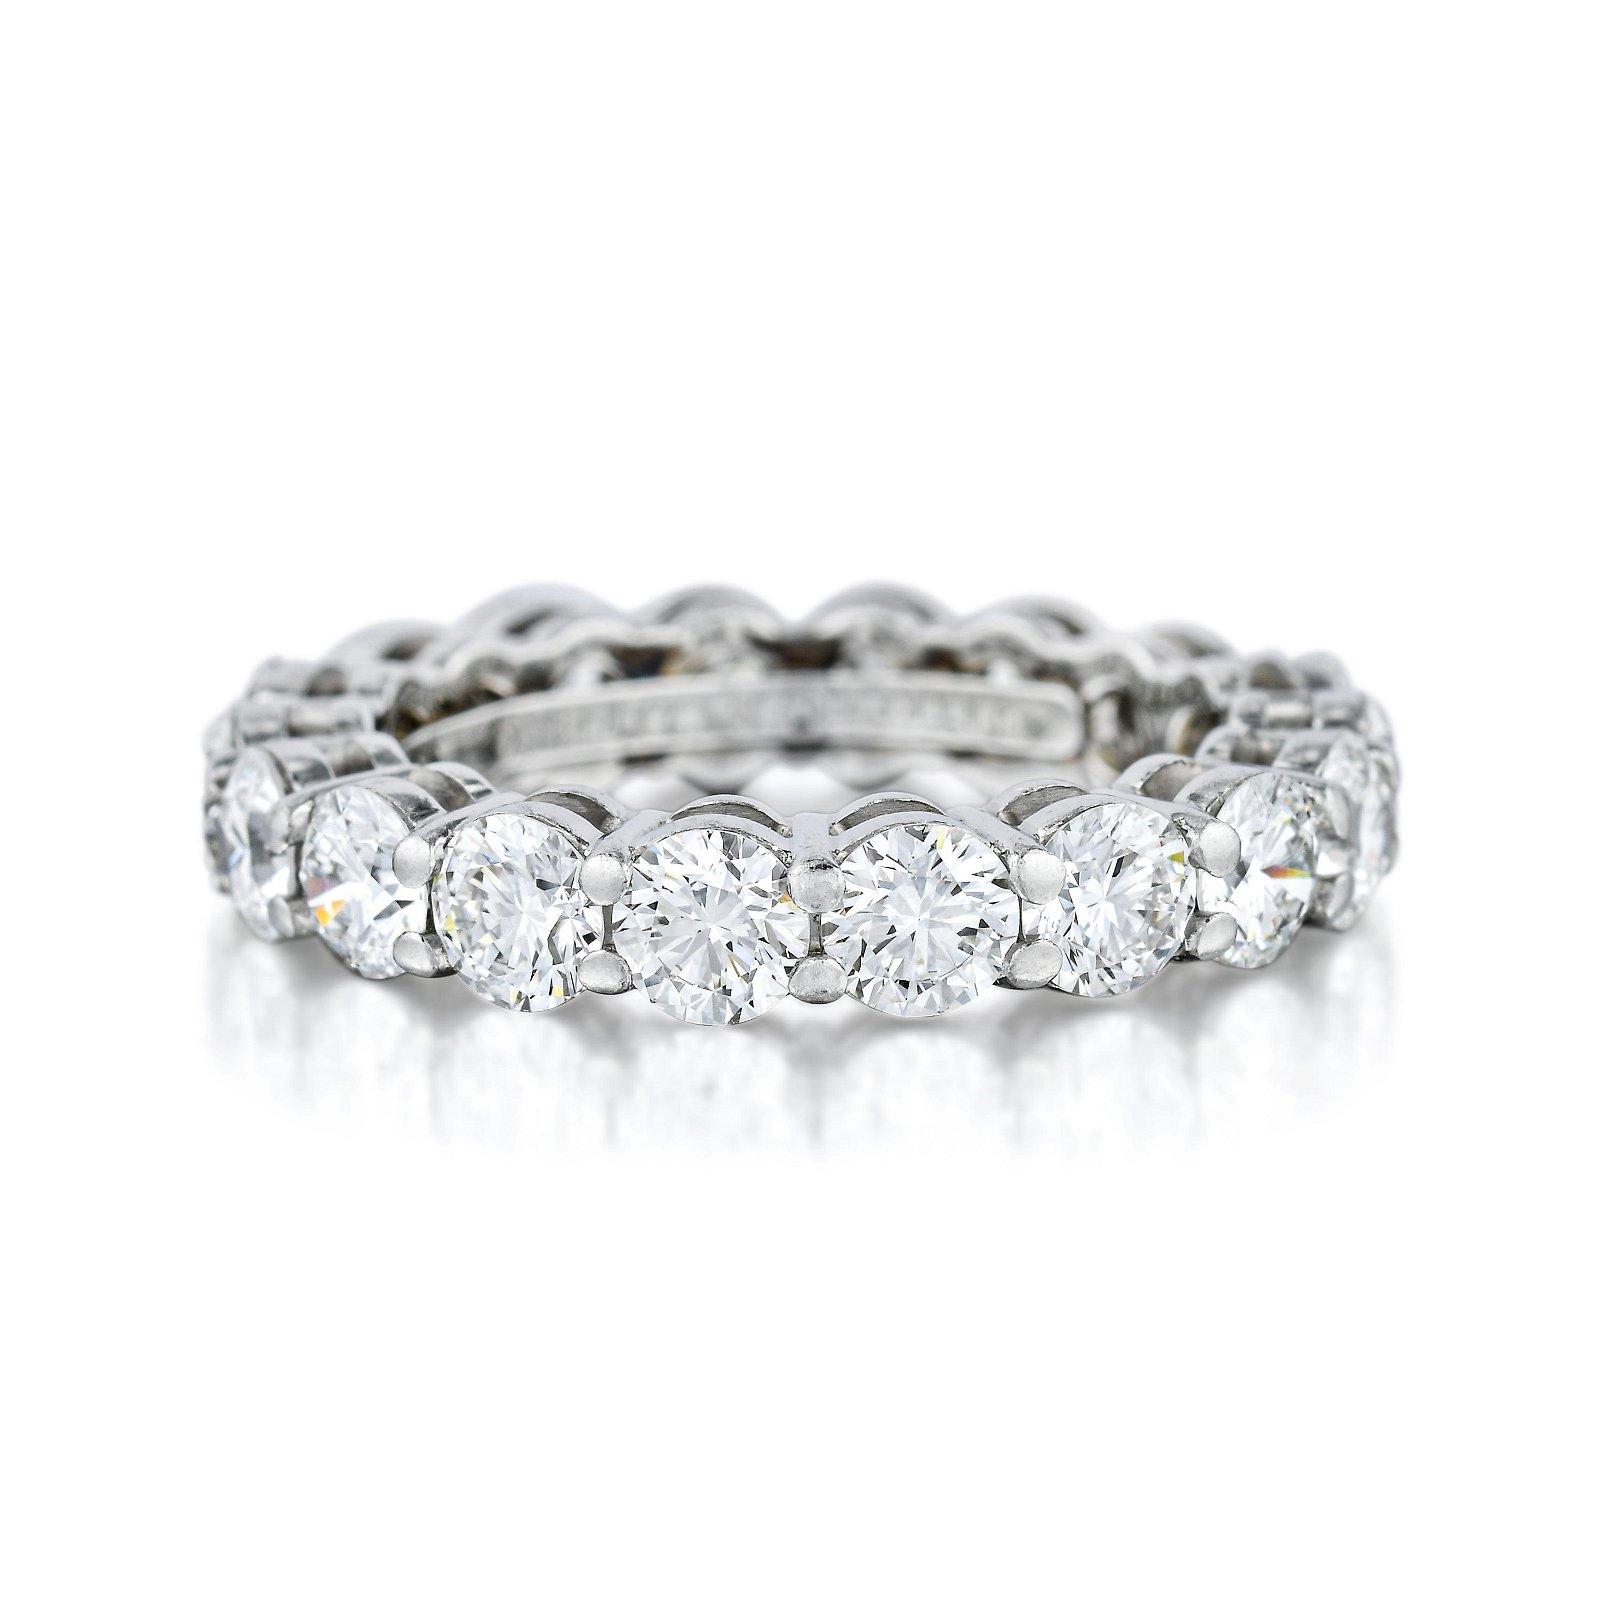 Tiffany & Co. Embrace Diamond Eternity Band